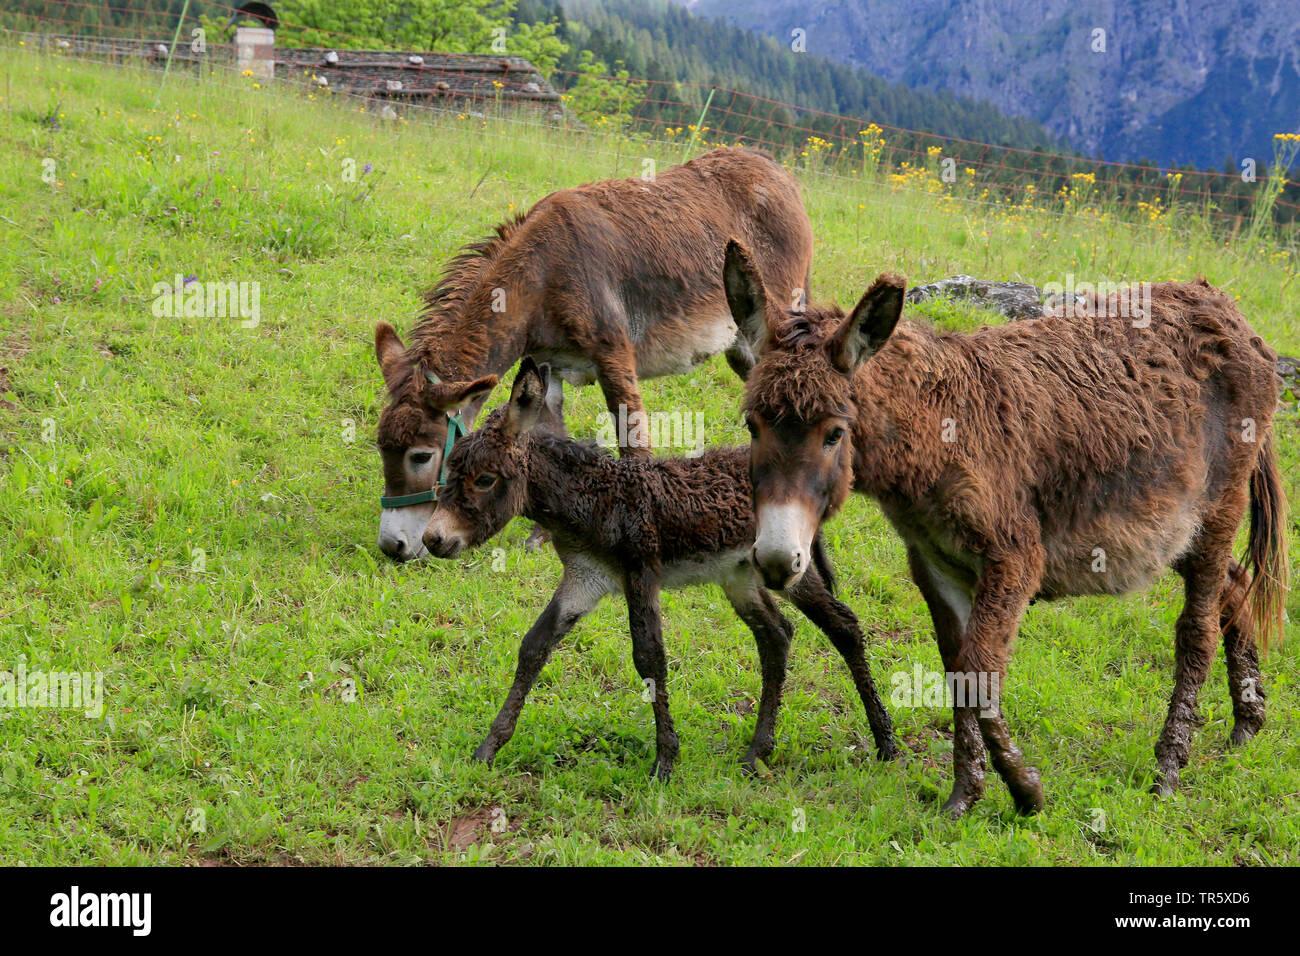 Esel, Hausesel, Haus-Esel (Equus asinus asinus), Eselfamilie auf der Weide, Deutschland | Domestic donkey (Equus asinus asinus), donkey family on a pa - Stock Image